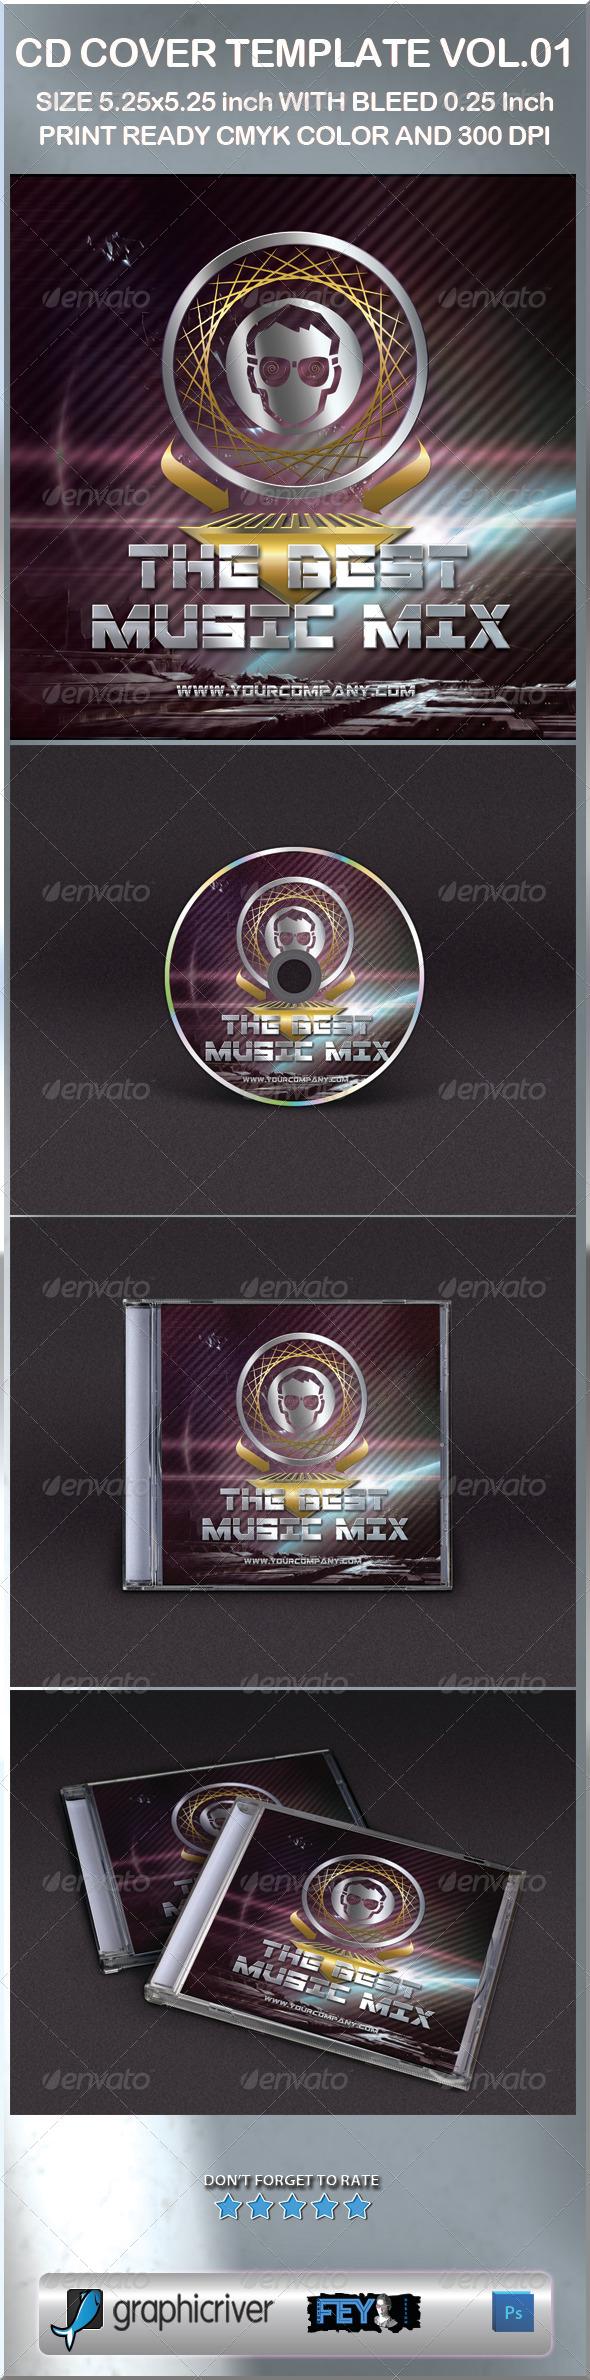 CD Cover Template Vol.01 - CD & DVD Artwork Print Templates